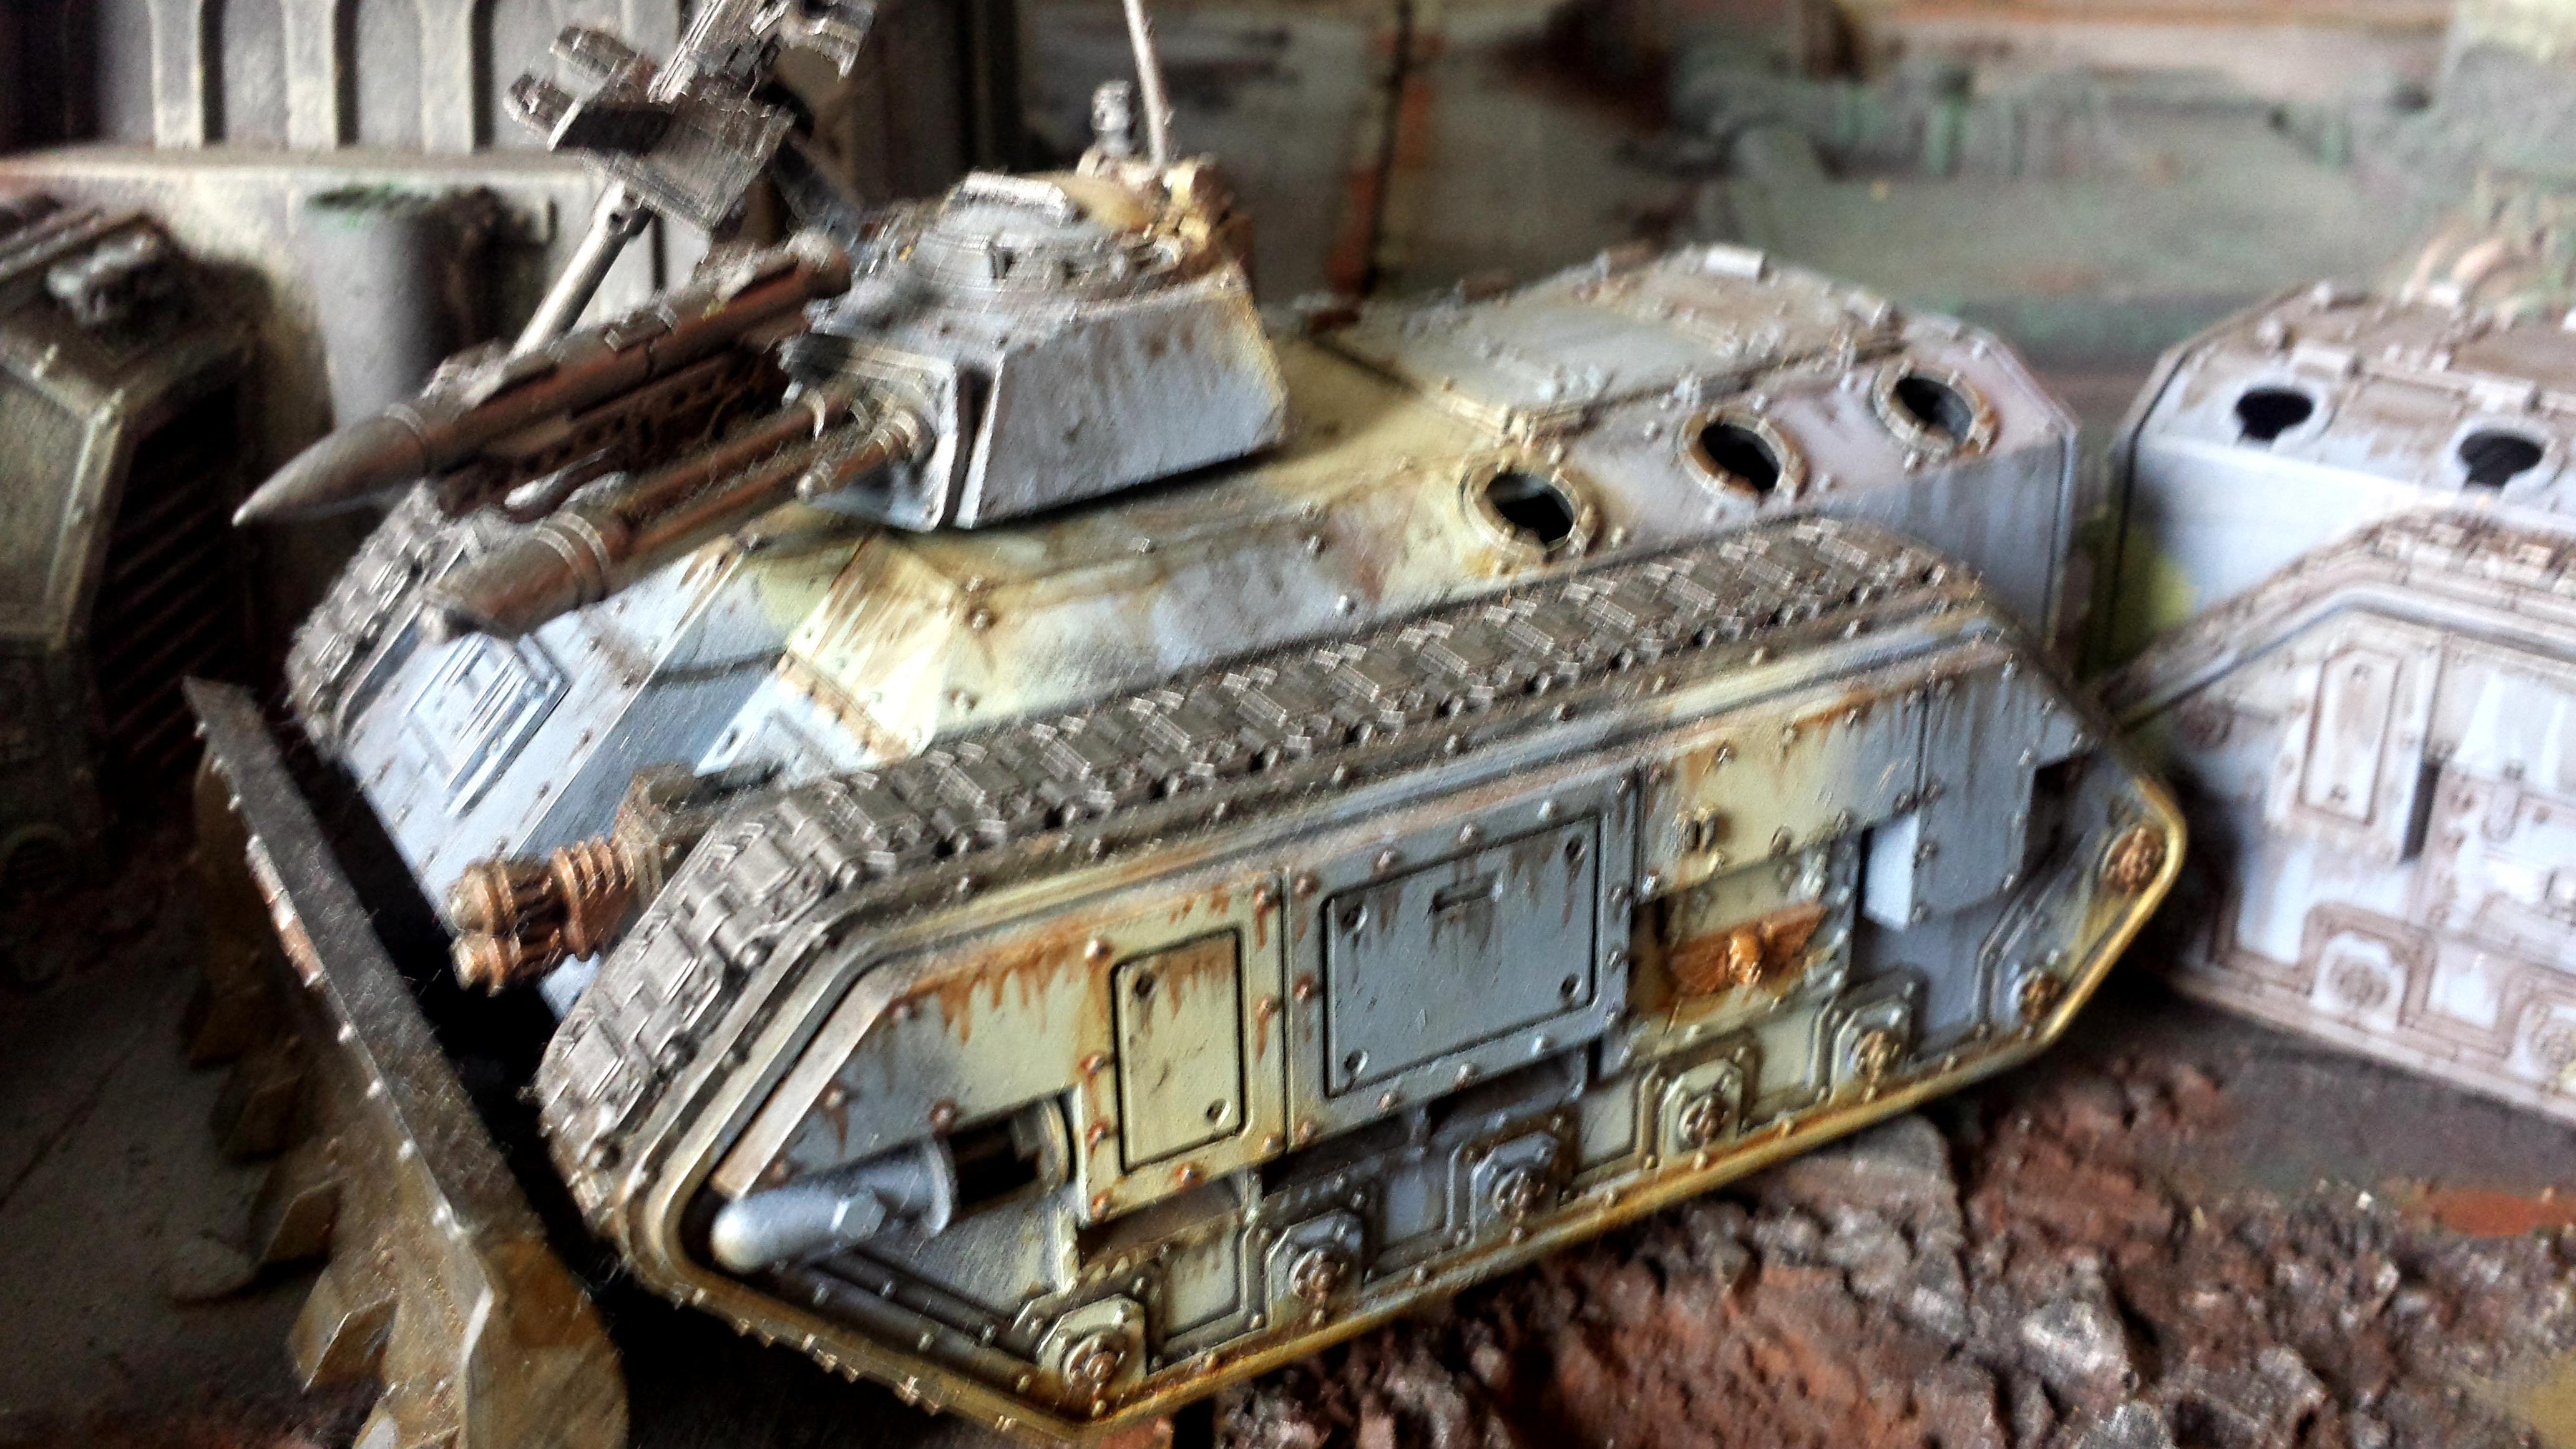 Astra Militarum, Chimera, Imperial Guard, Steel Legion